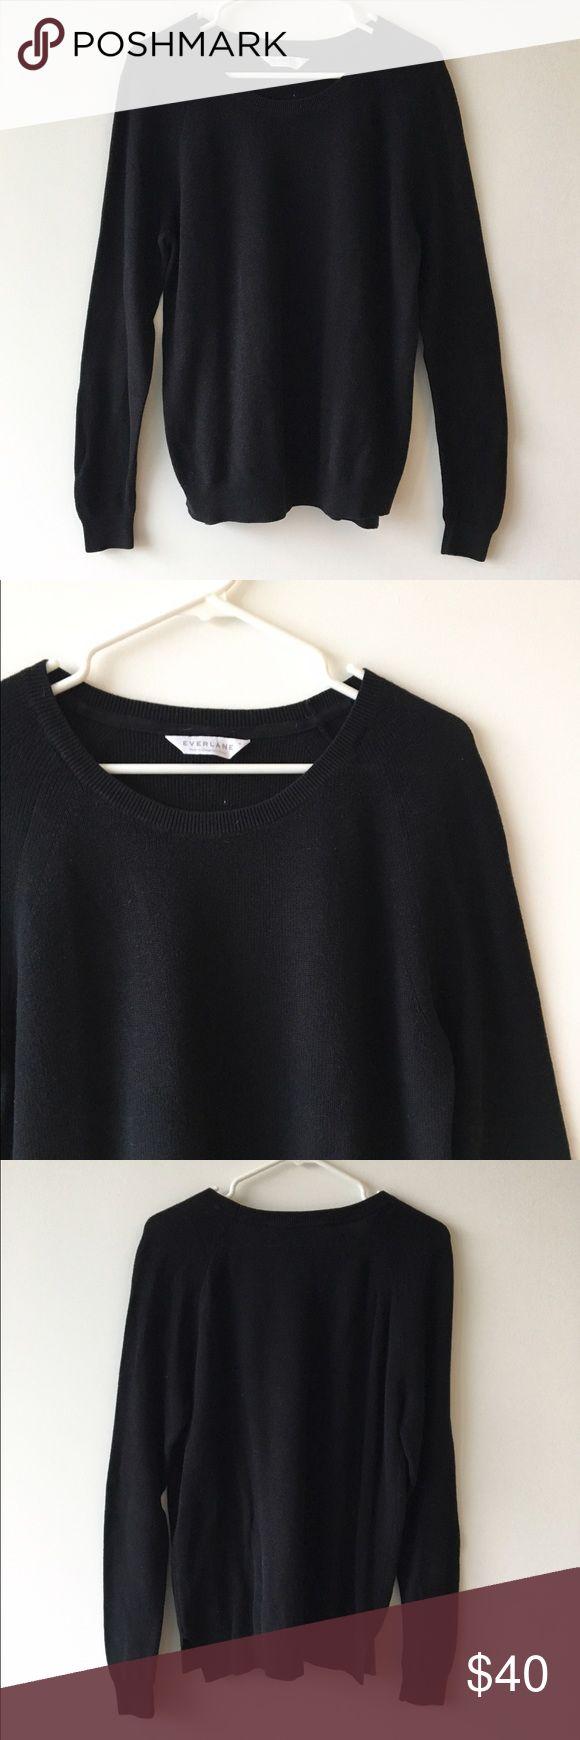 Everlane Black Cotton Sweater Beautiful lightweight cotton sweater in great condition. Everlane Sweaters Crew & Scoop Necks